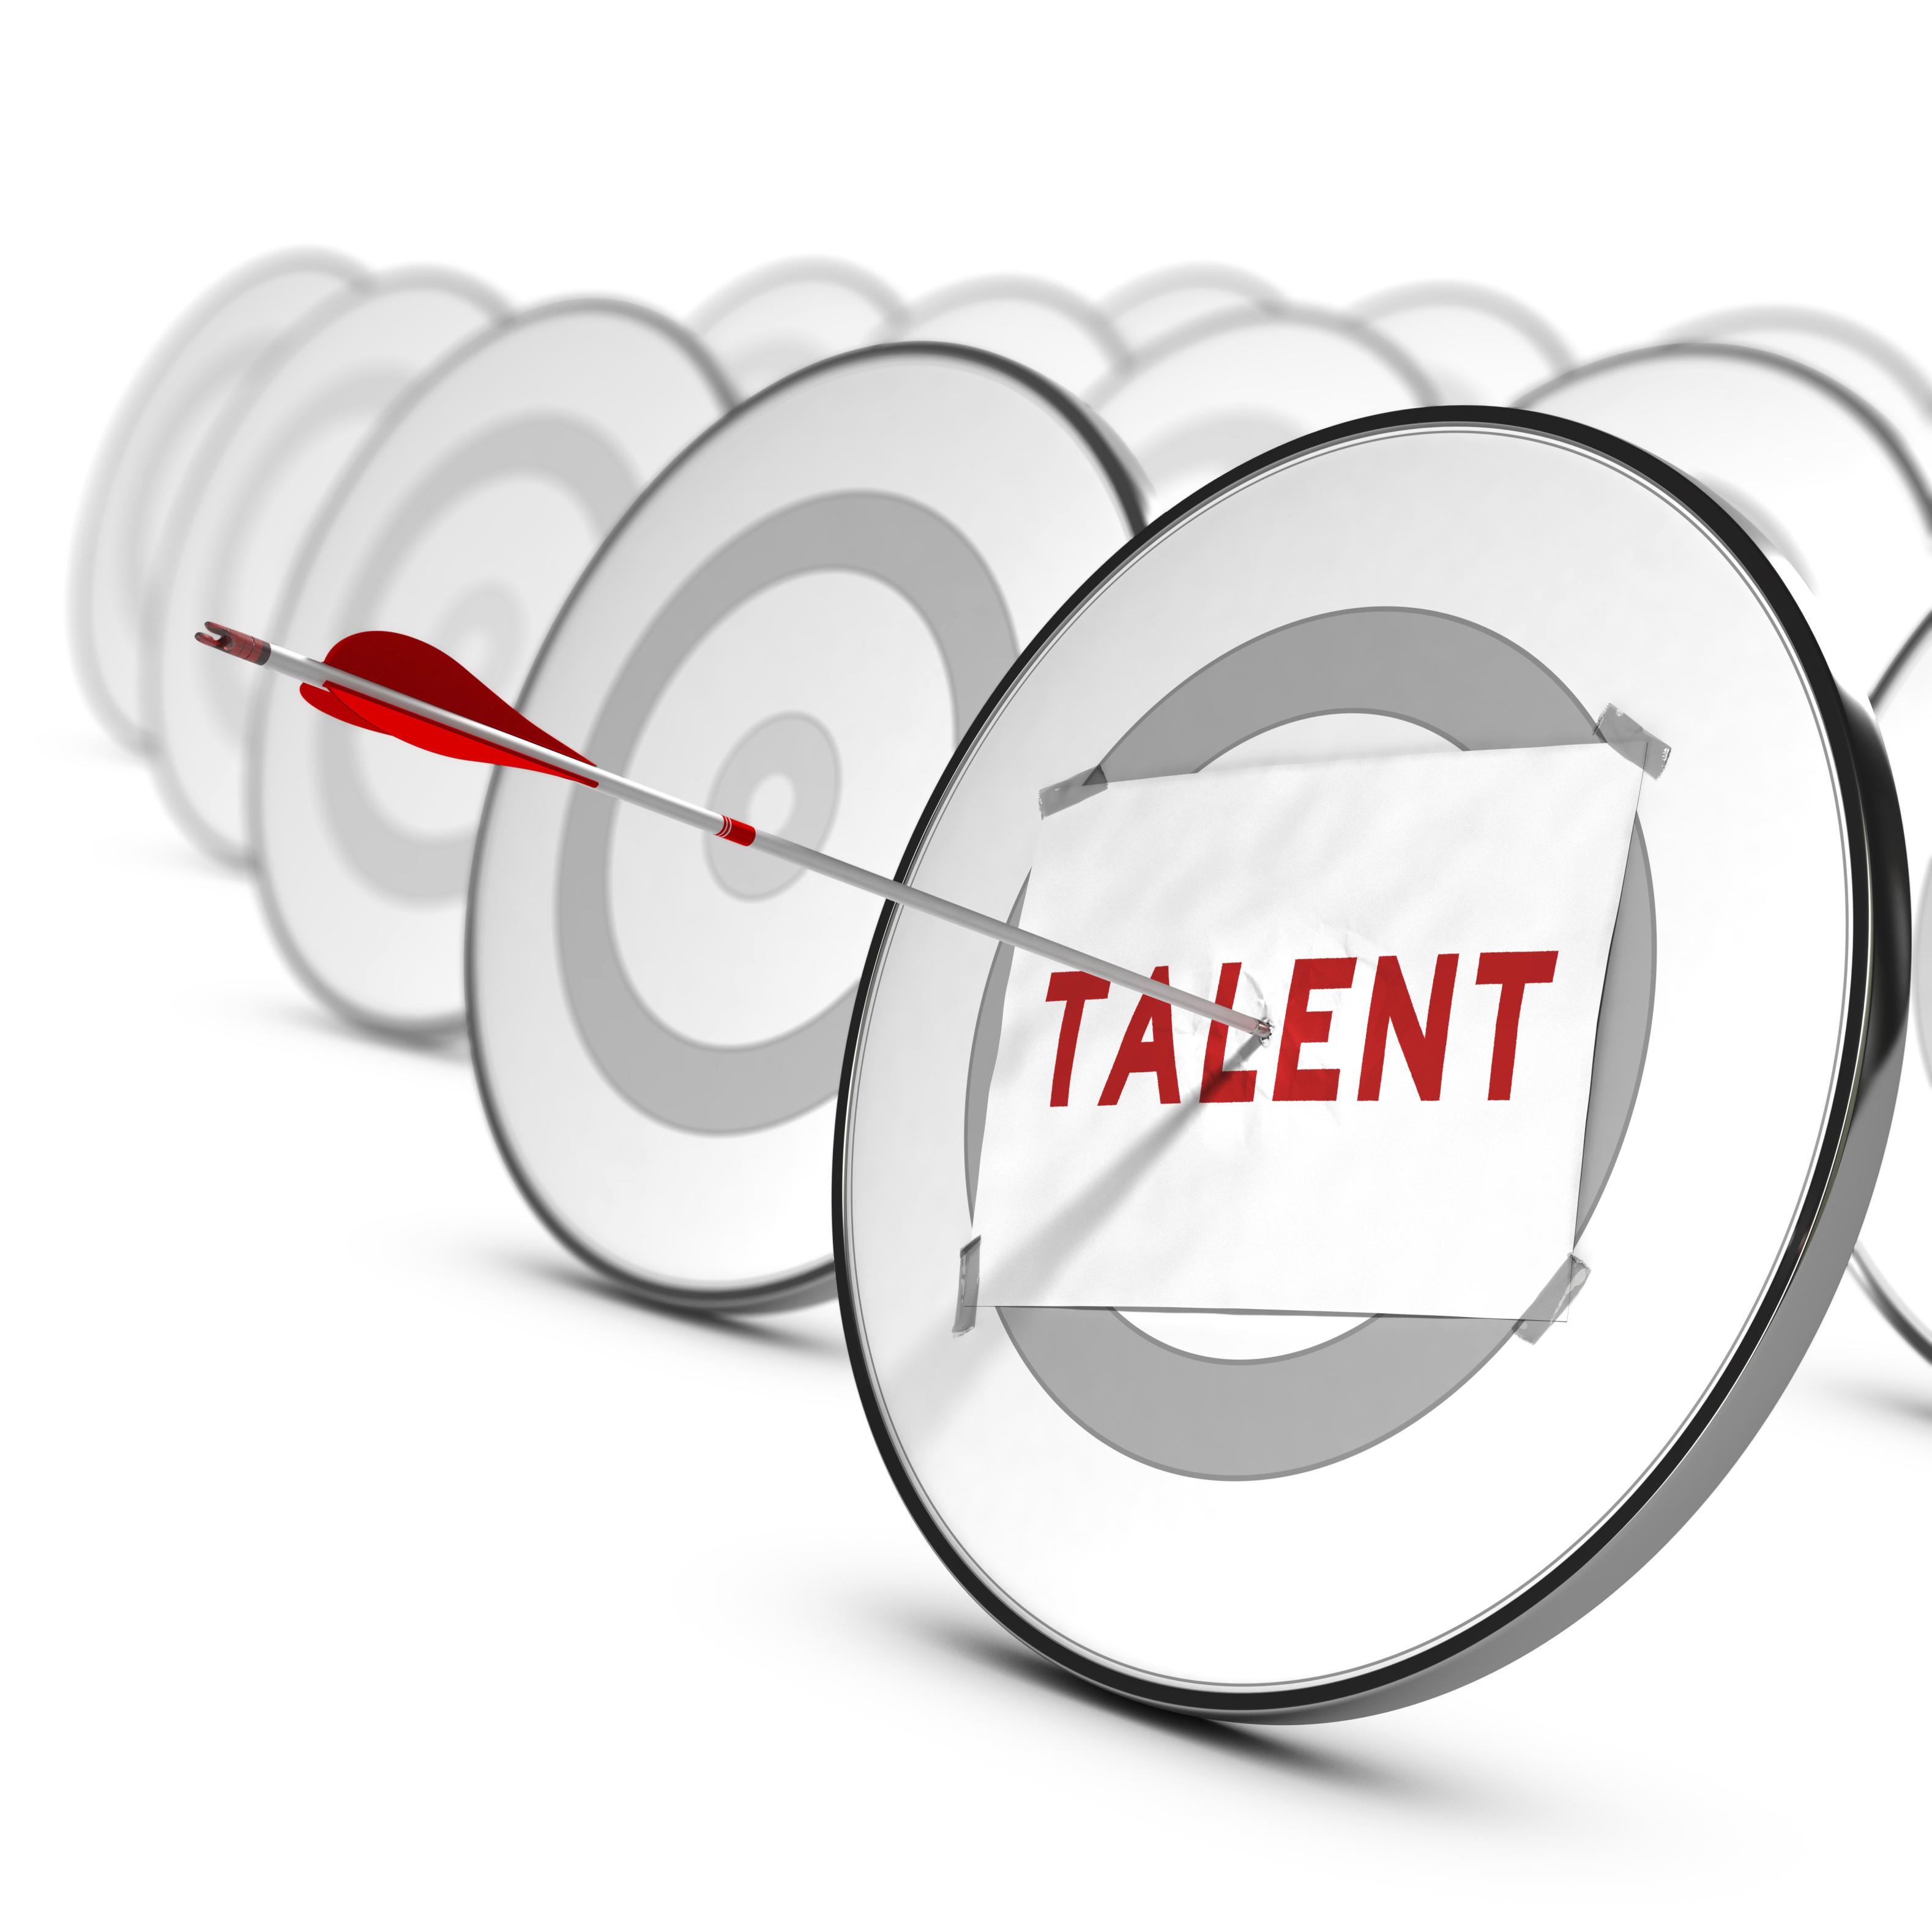 retencion de talento